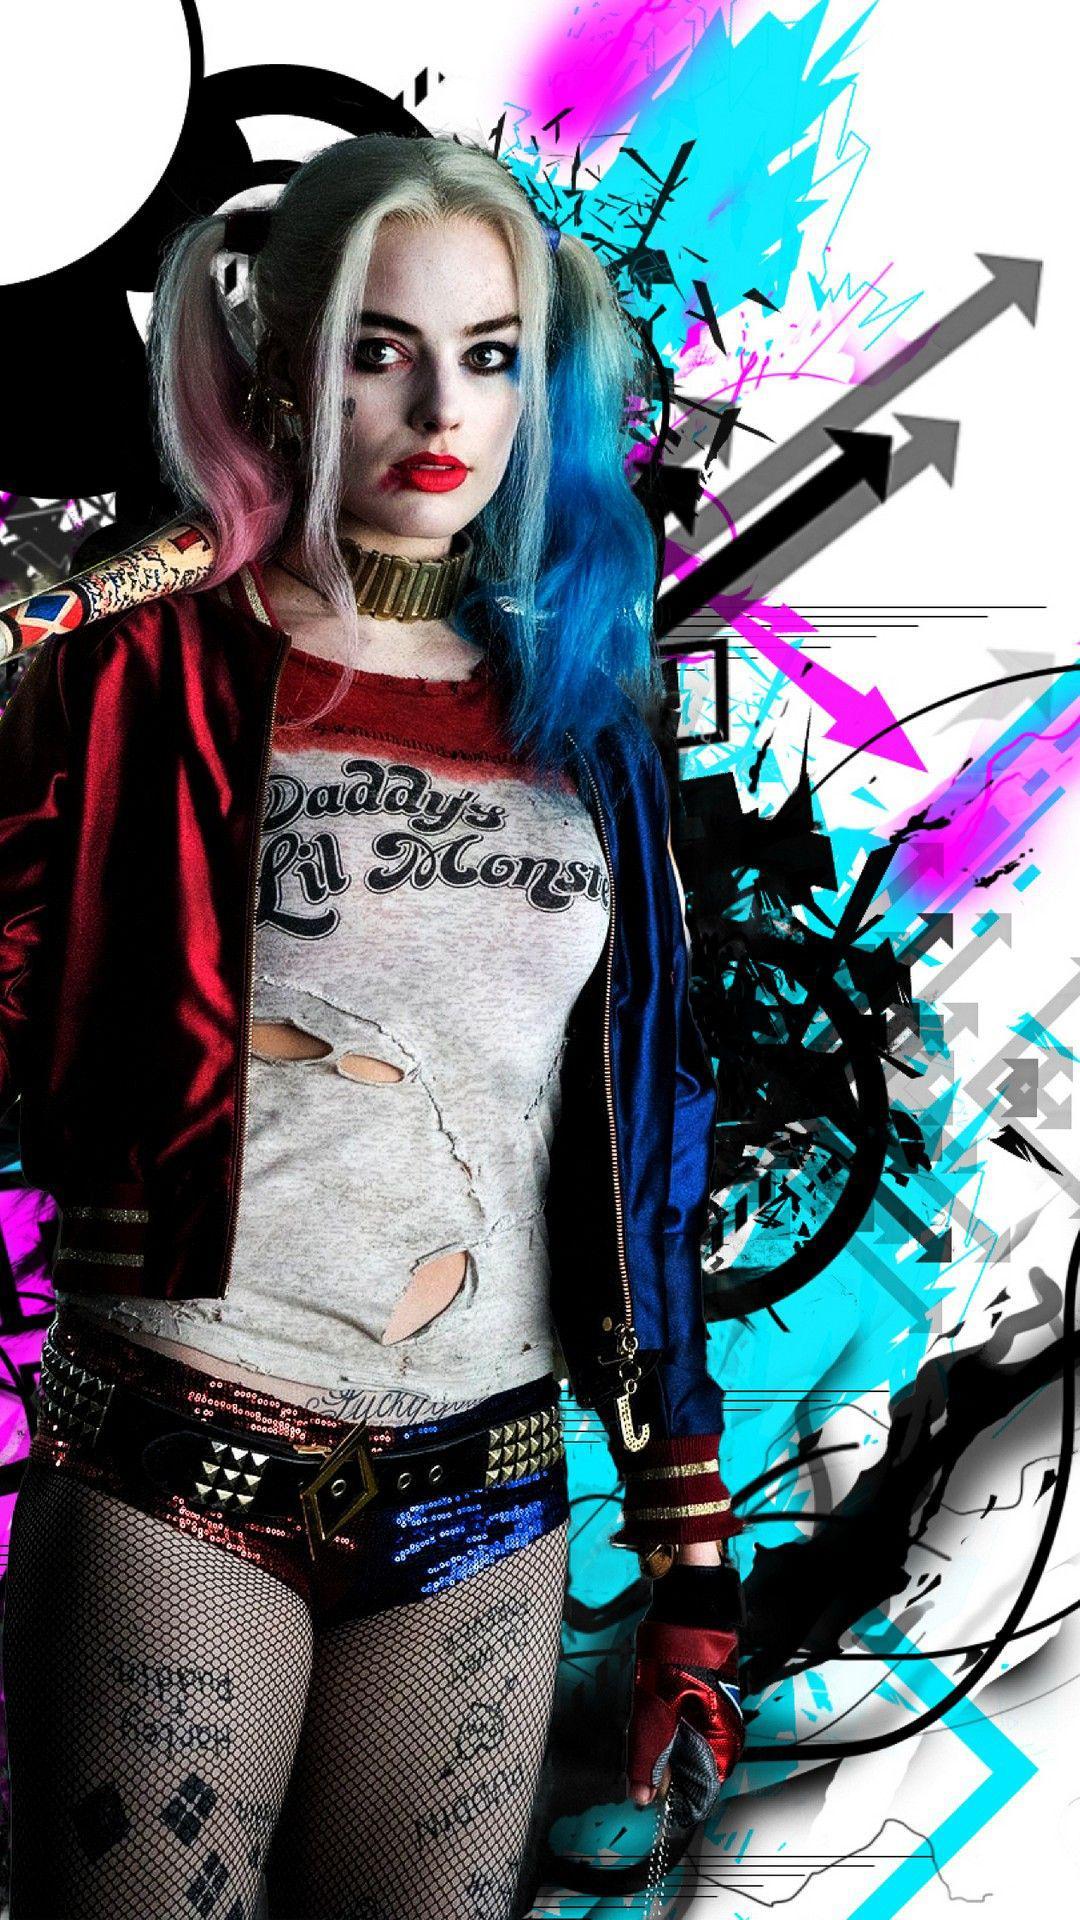 Harley Quinn wallpaper HD (30 Wallpapers) - Adorable ...